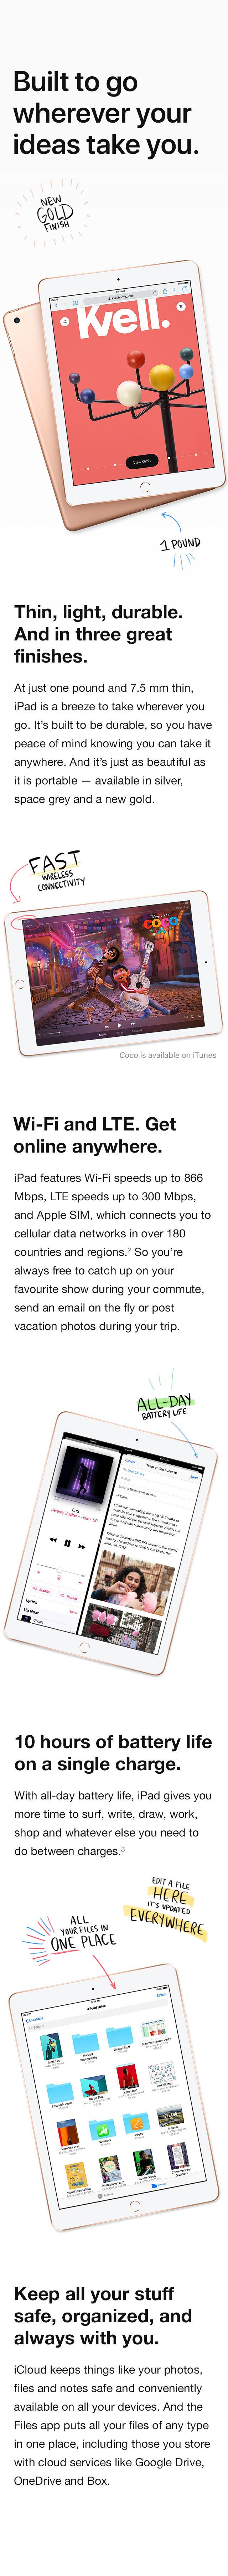 Ipad Mobility Bell Canada Fibe Tv Wiring Diagram Maximum Quantity Reached